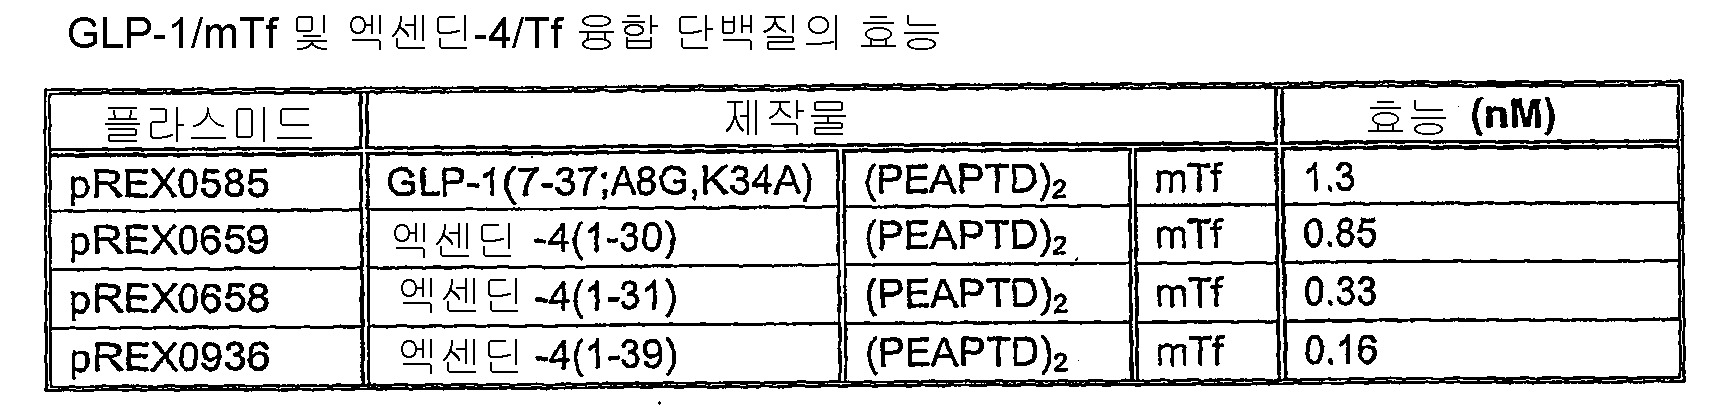 Figure 112009011070596-PCT00001